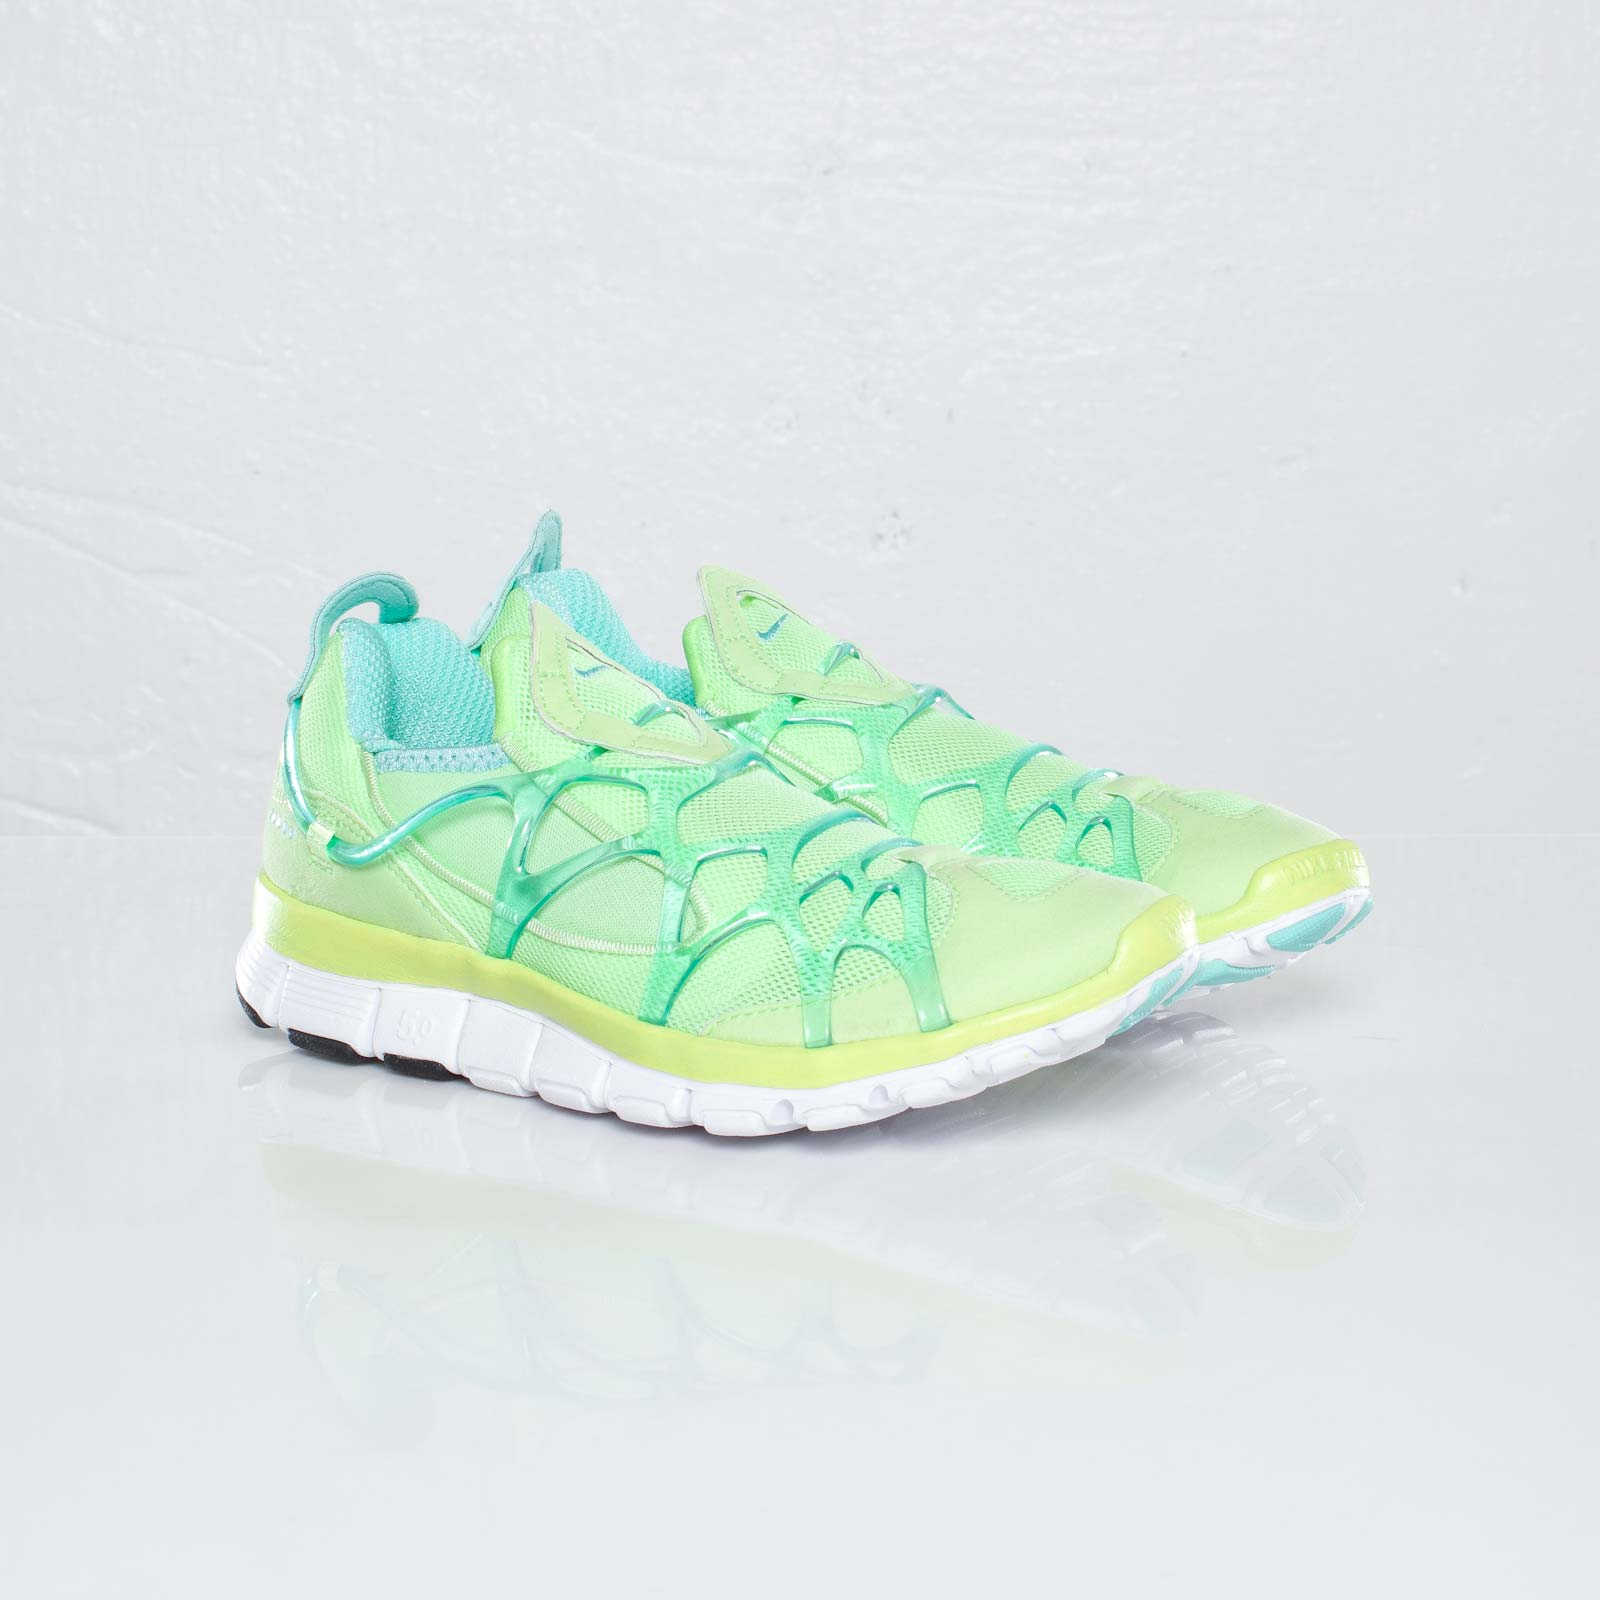 Nike Wmns Kukini Free - 110305 - Sneakersnstuff  2f744e59e